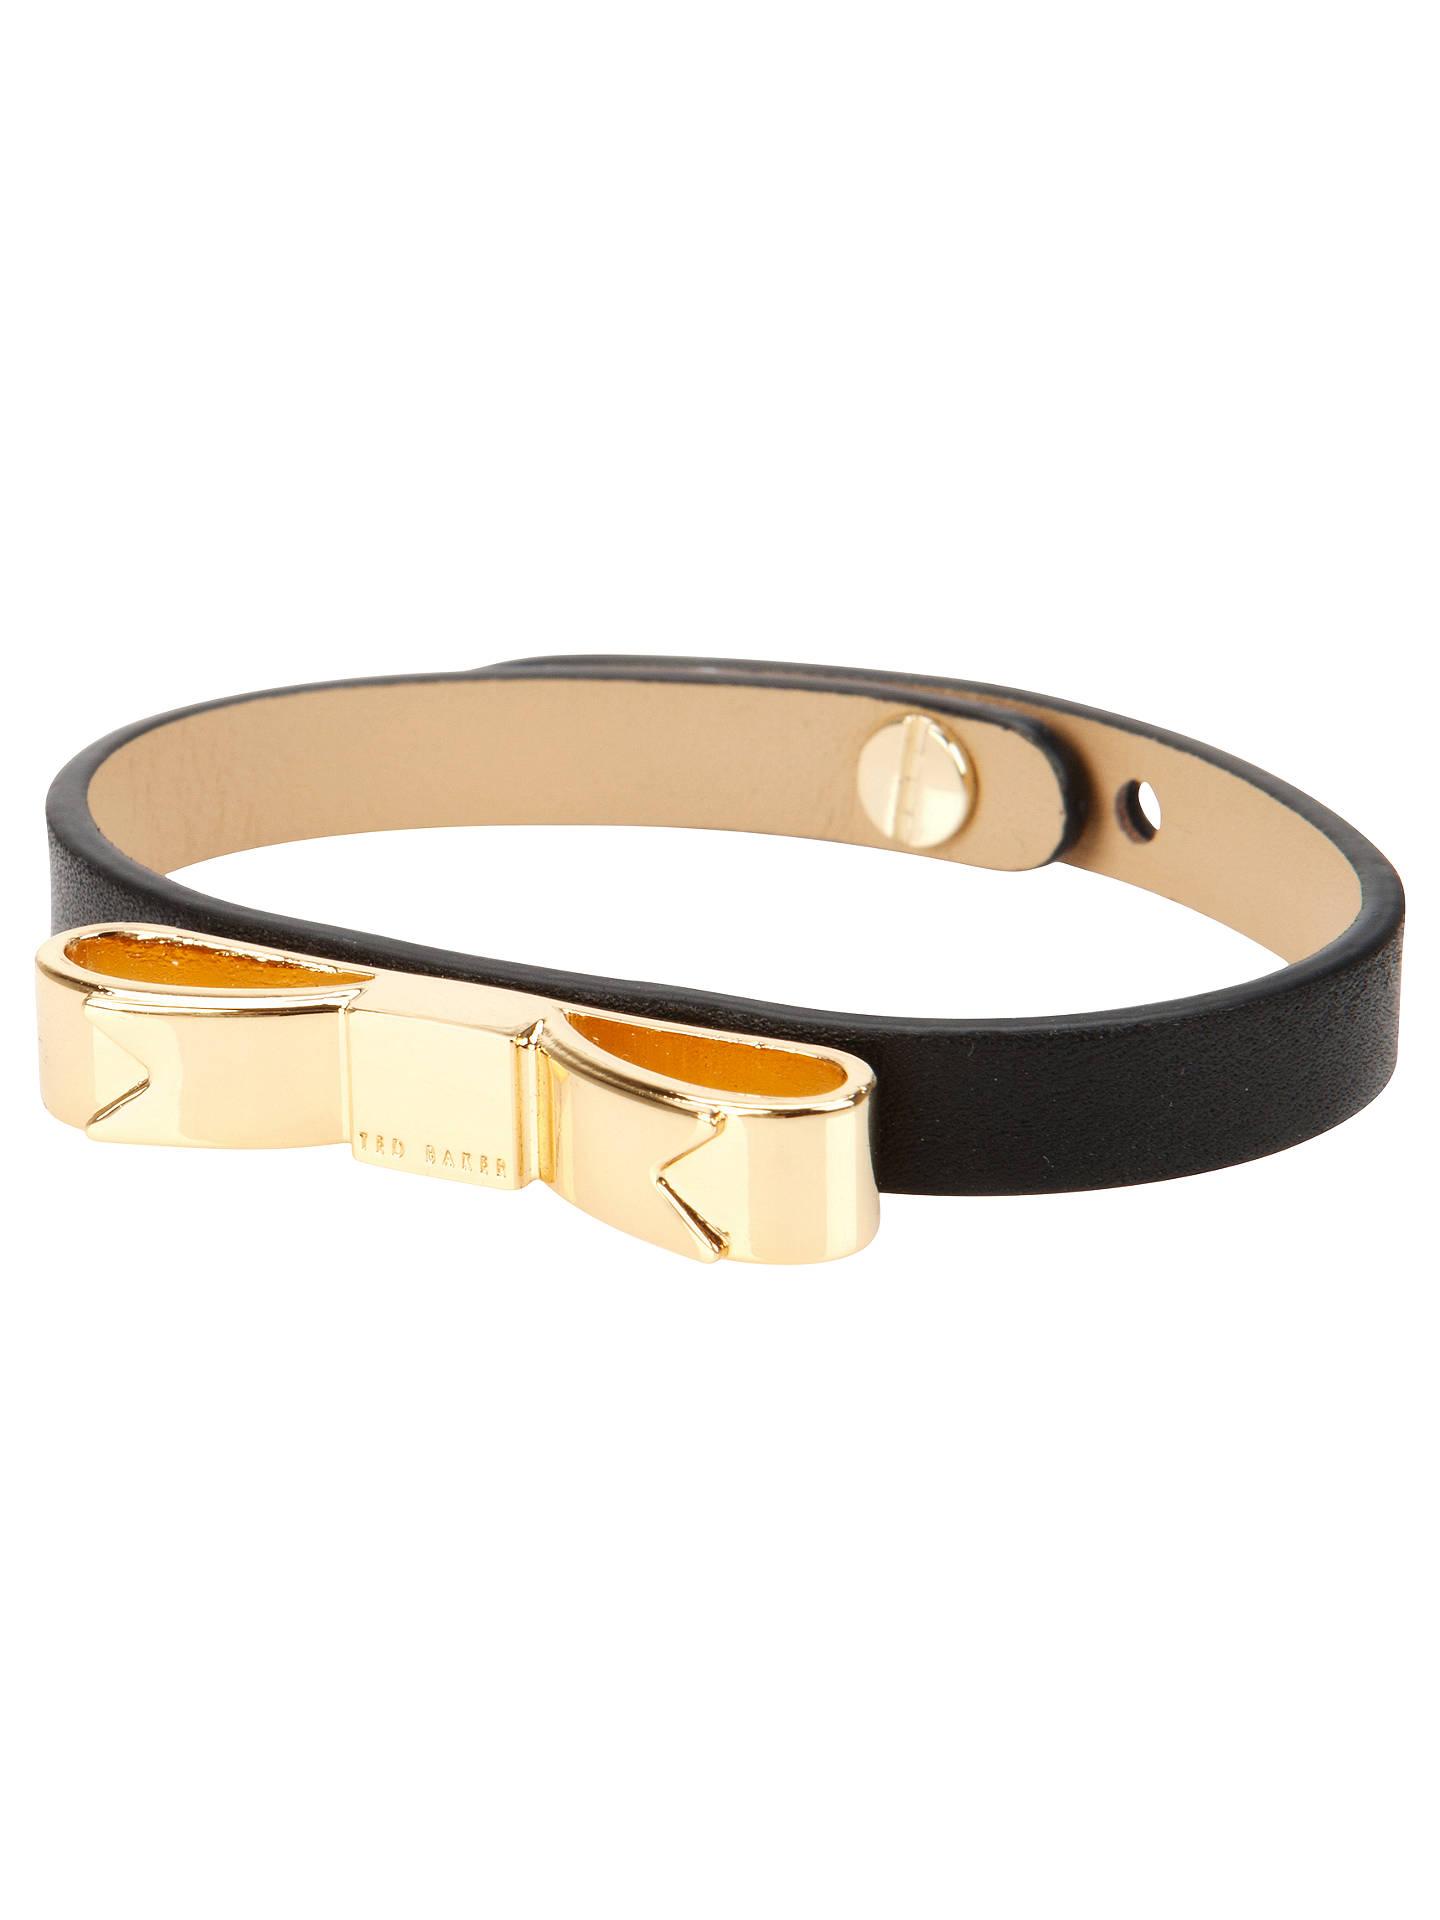 068dc03d69a0 Ted Baker Bowena Bow Bracelet at John Lewis   Partners